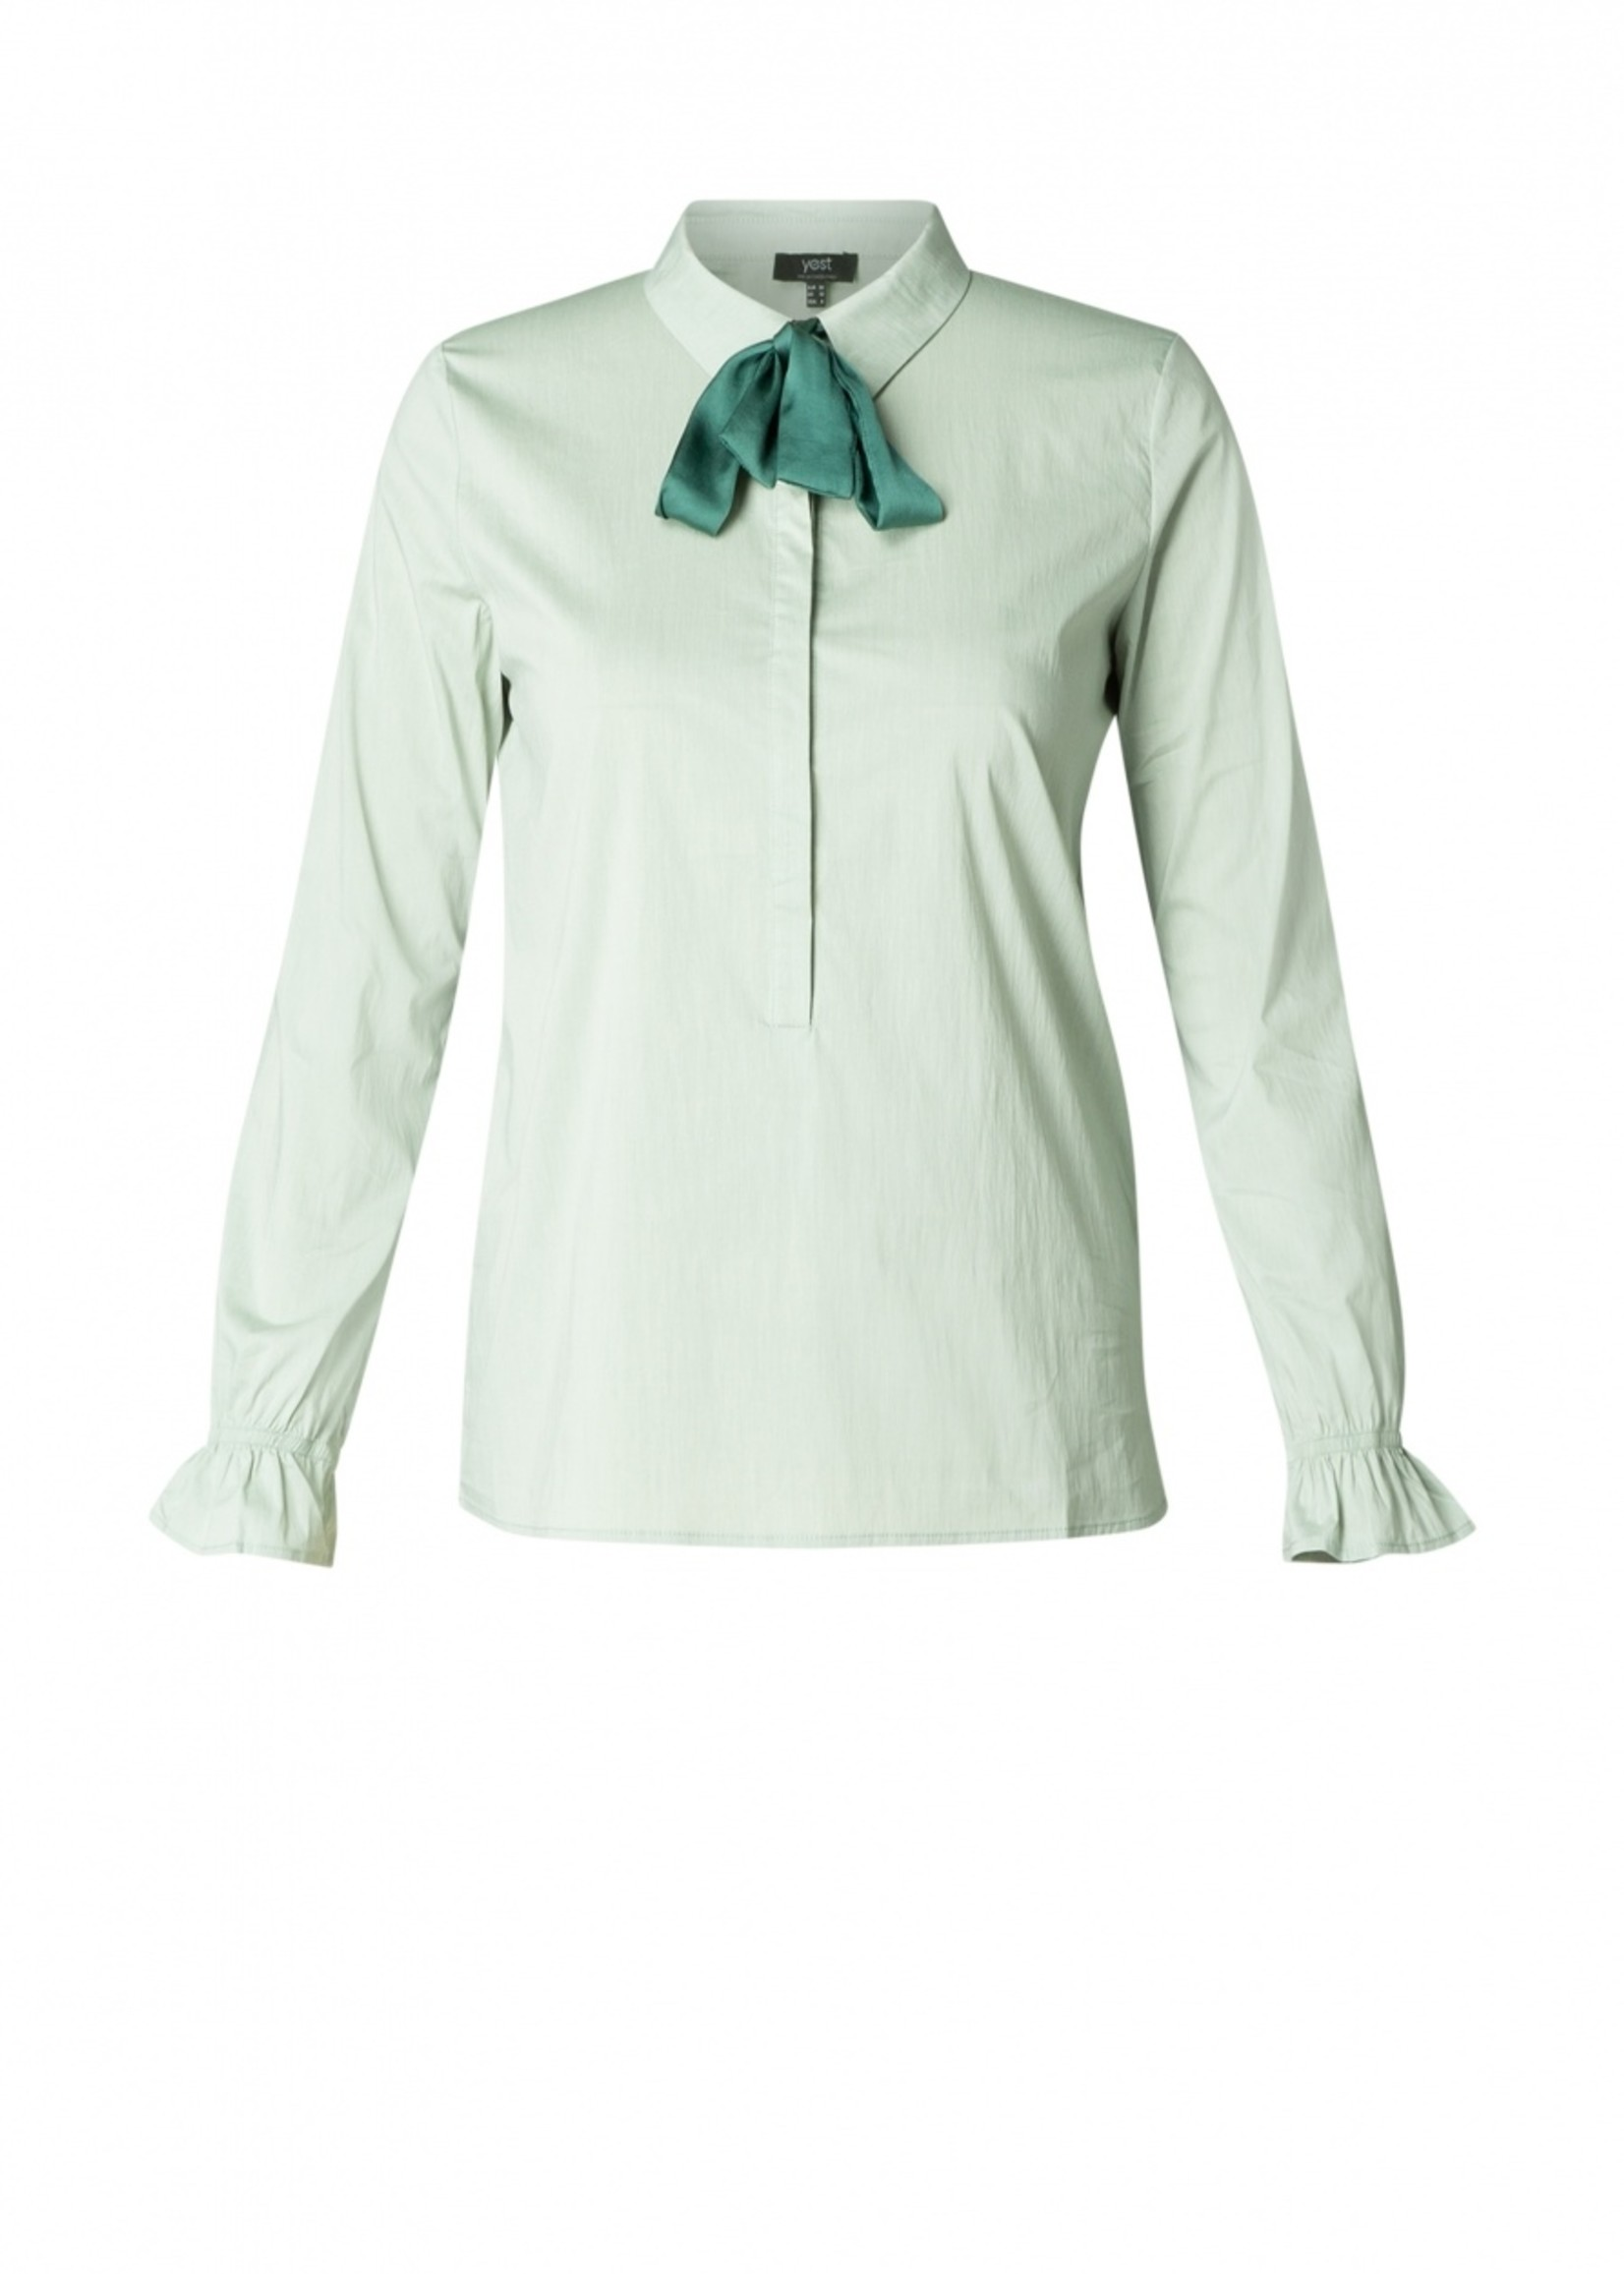 Yesta Yesta blouse Brooklyn (A002281)